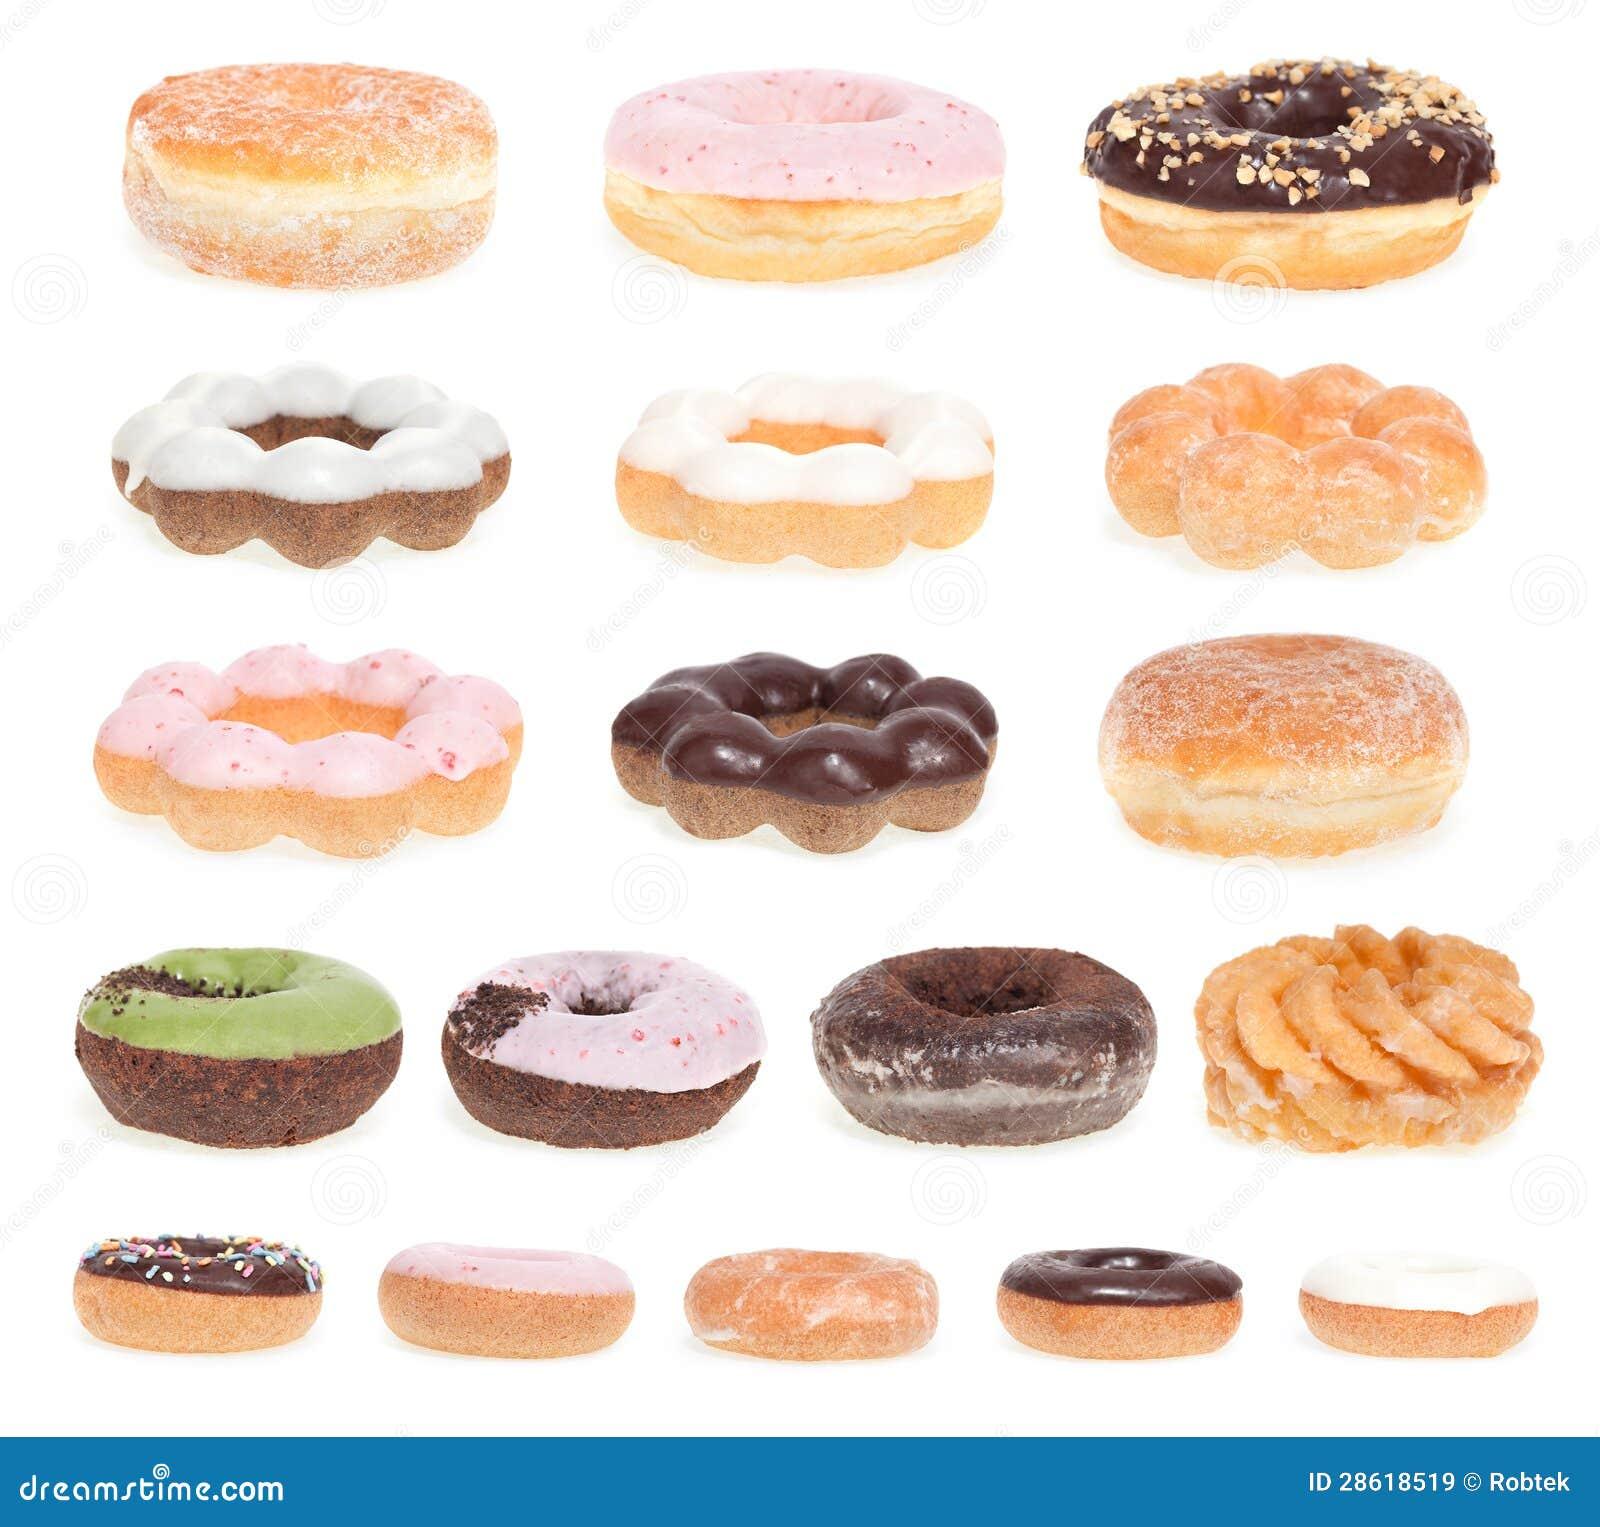 Old Fashioned Donut Krispy Kreme